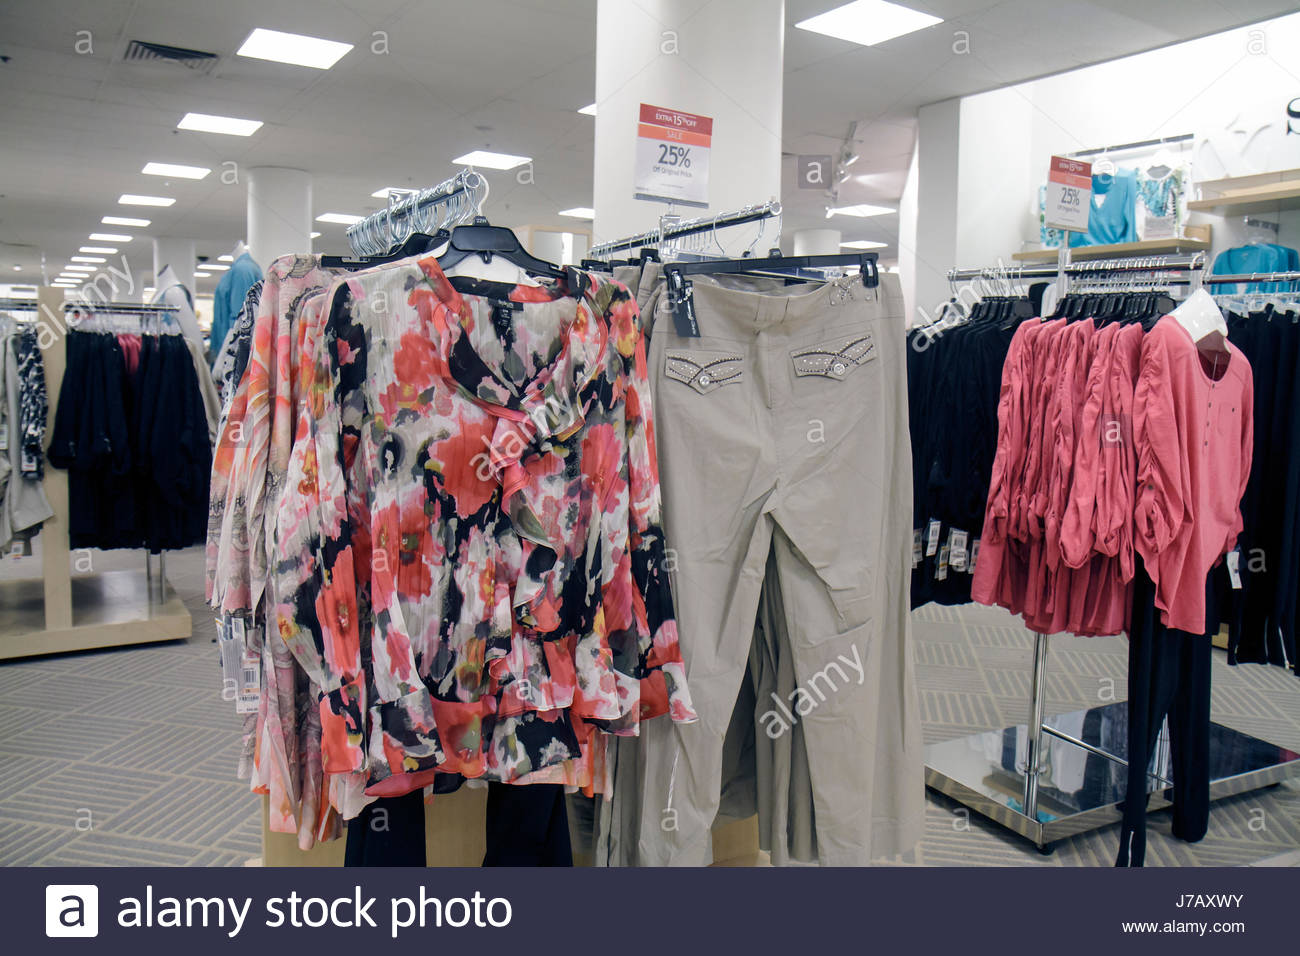 b4fdc5180 Florida Miami Dadeland Mall Shopping expositor para la venta de los grandes  almacenes Macy s ropa mujer